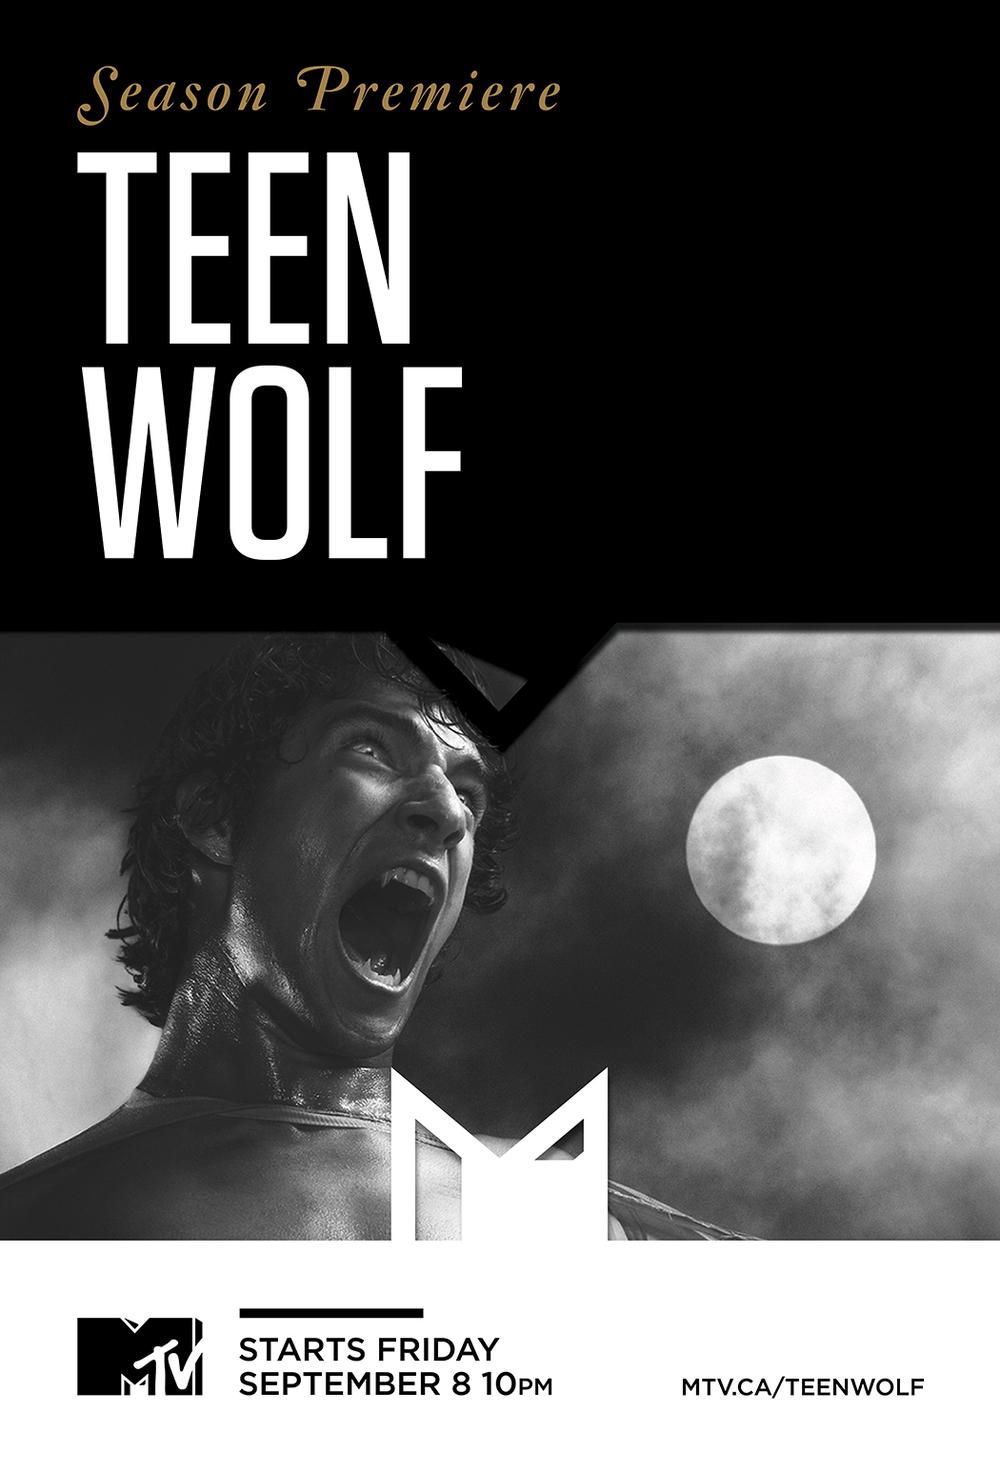 MTV_TEENWOLF_3_RVIZ.jpg